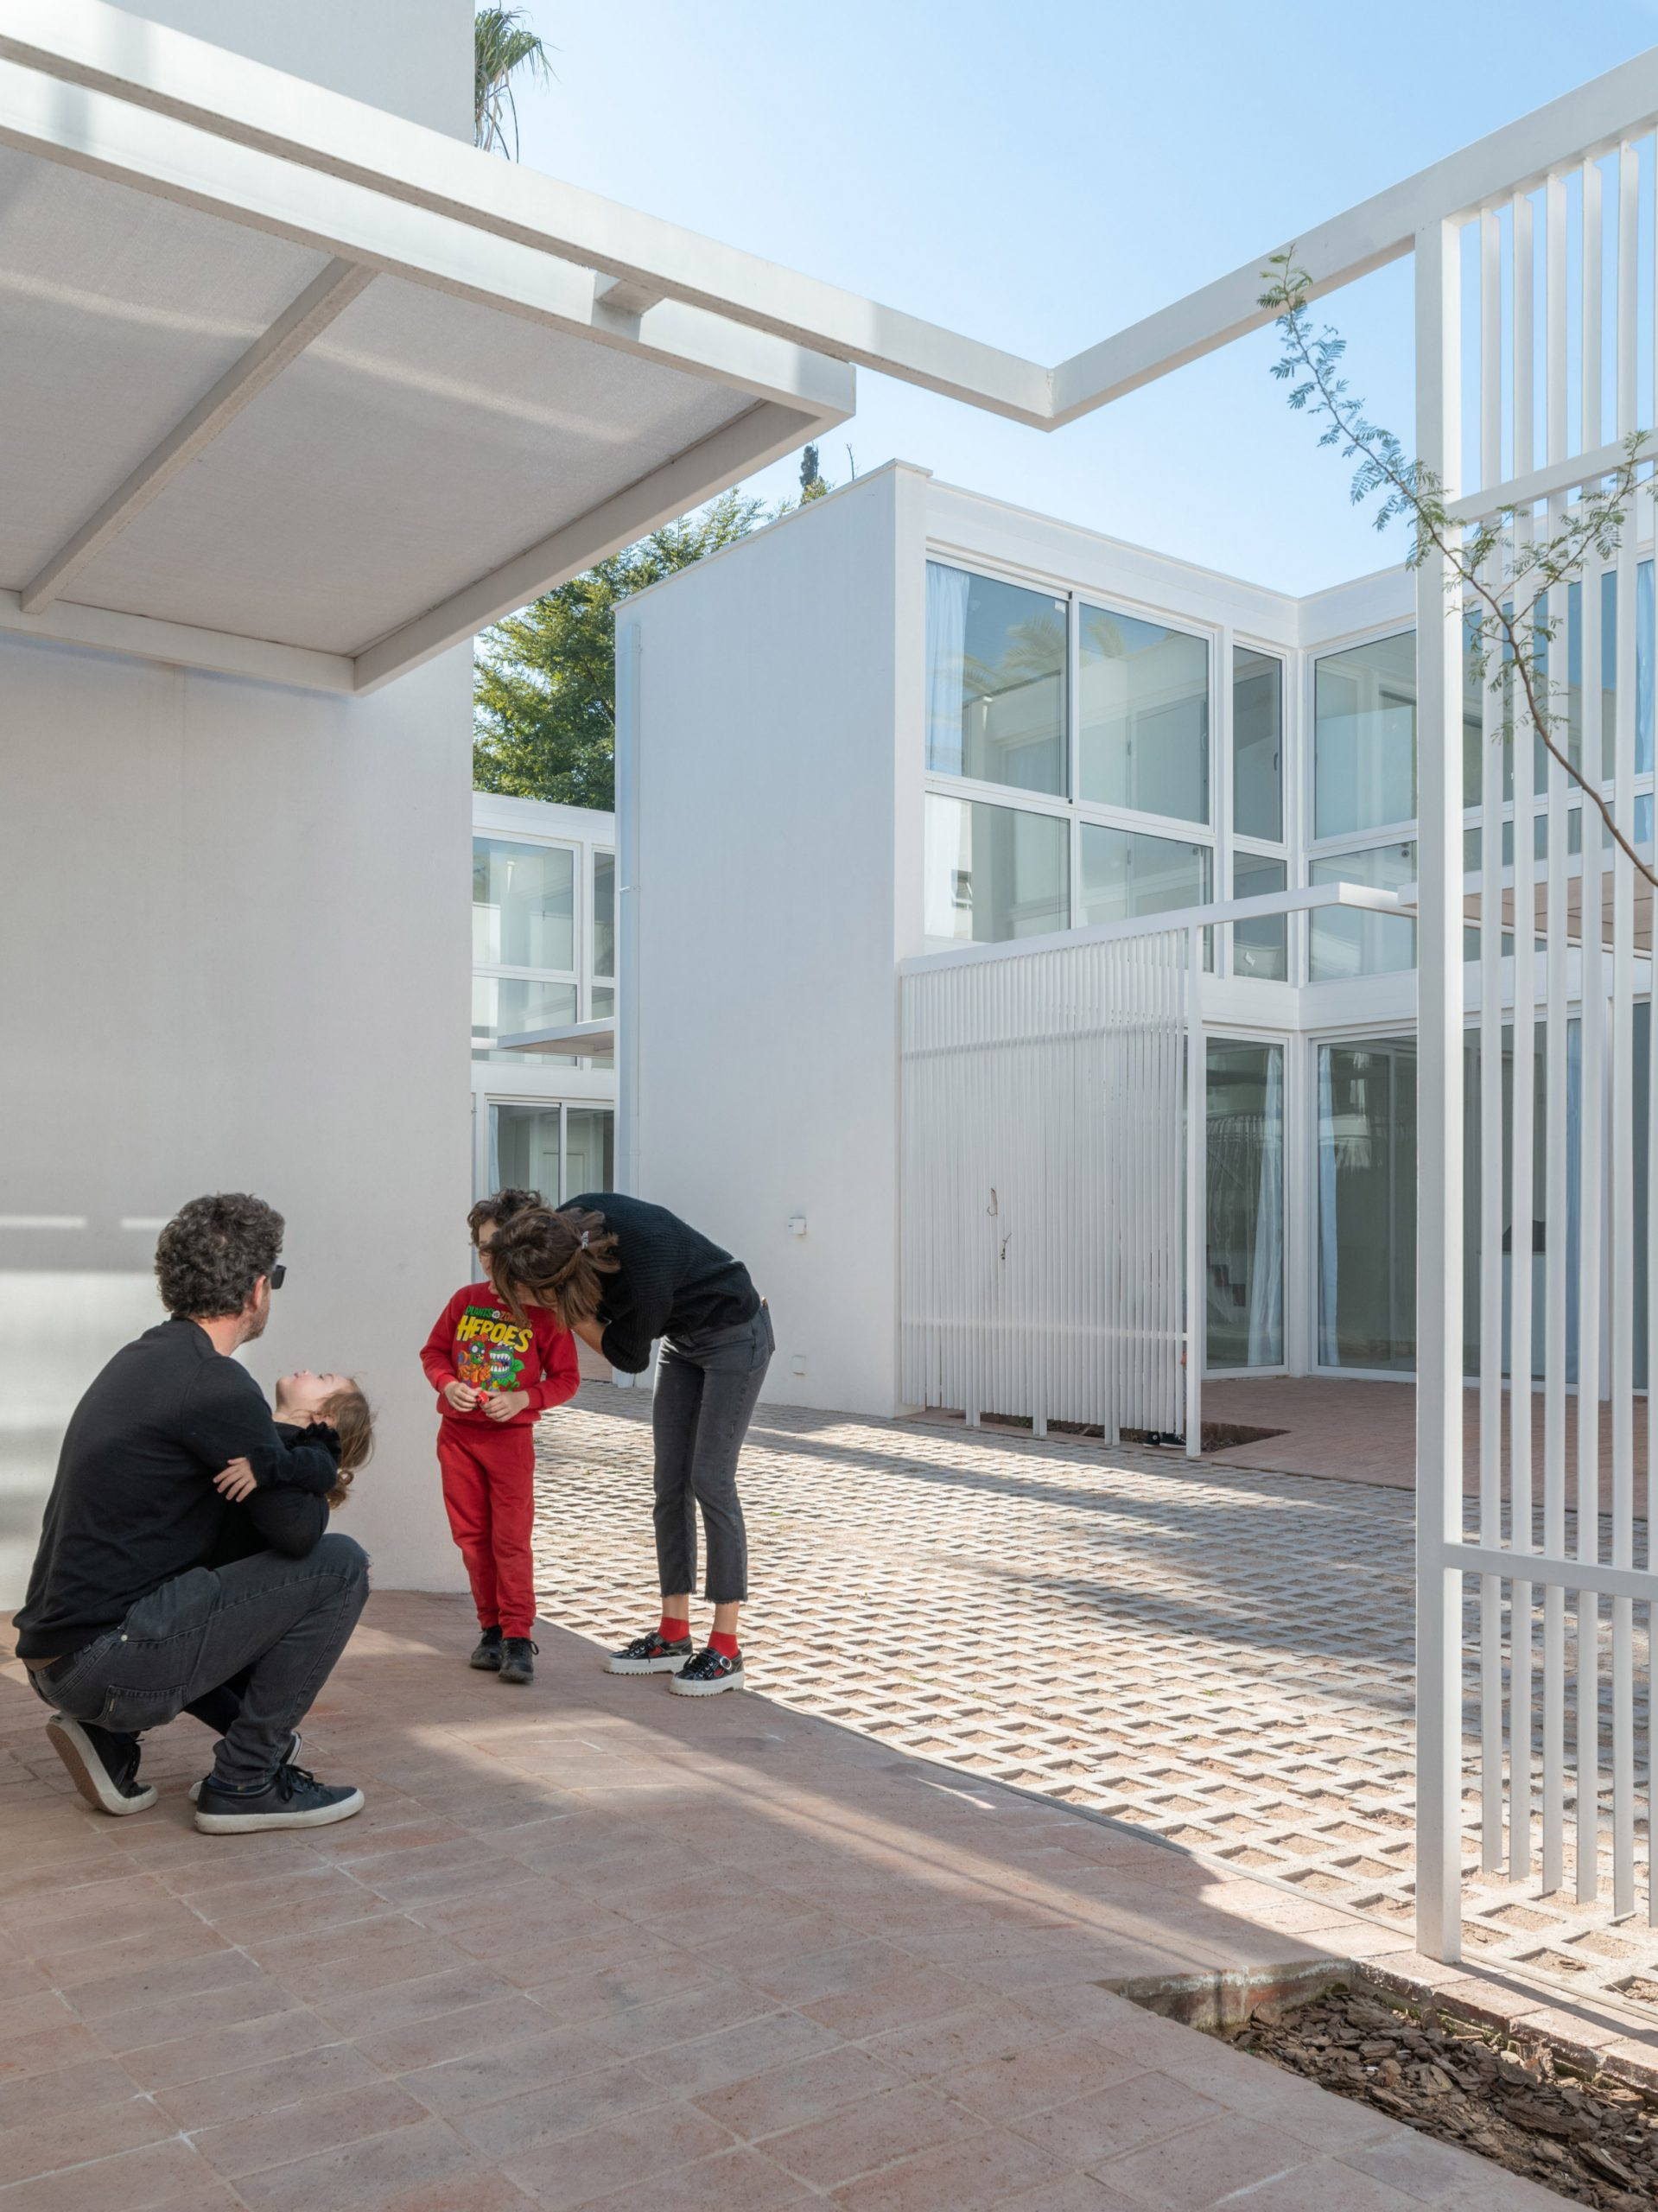 Azaleas housing inVilla Allende by Pablo Lorenzo